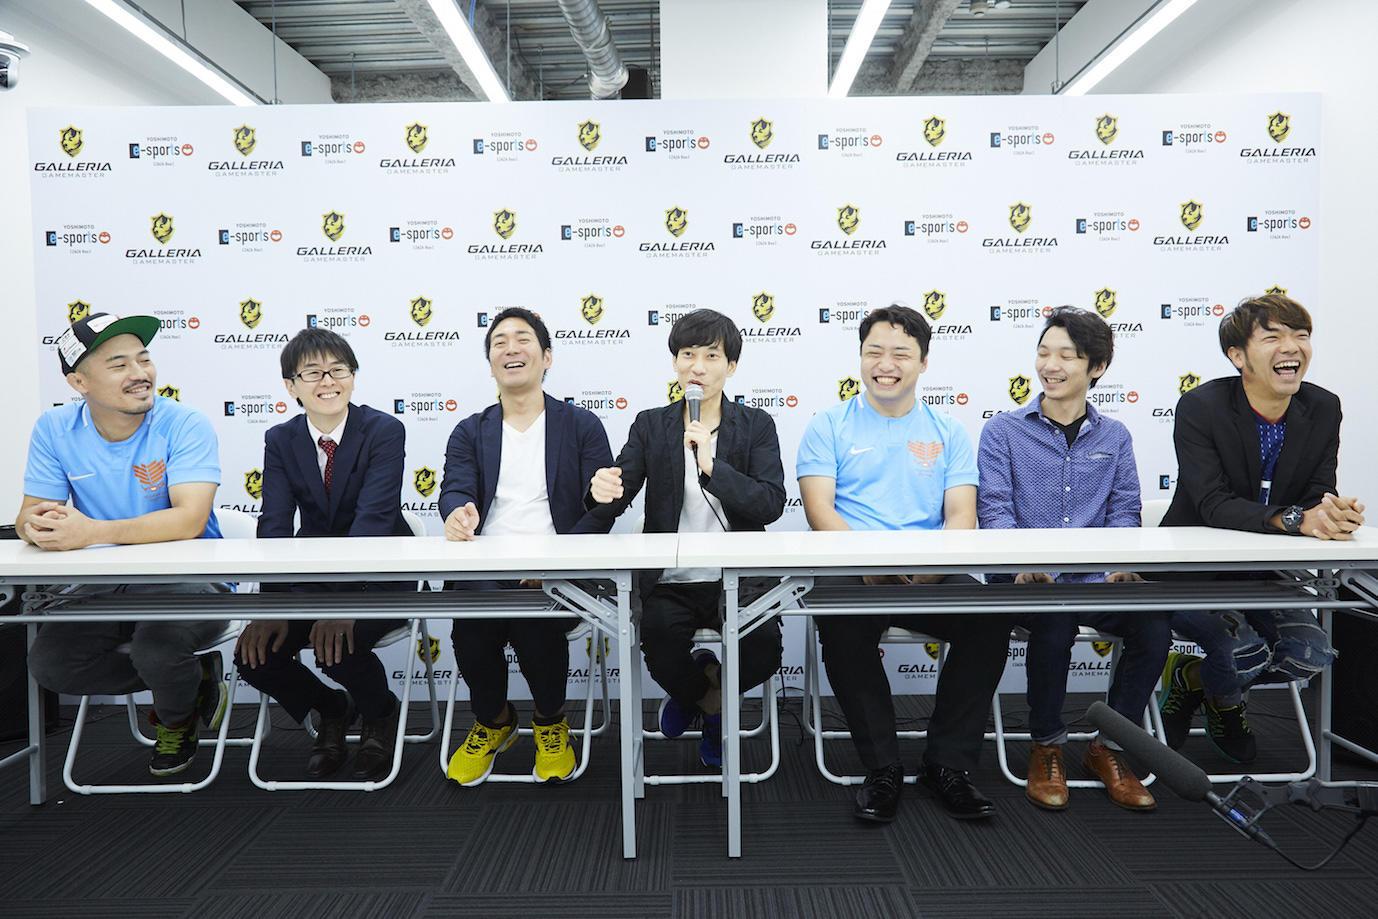 http://news.yoshimoto.co.jp/20180913001348-027def52aa0521ae4ce8b8a586f6012817967289.jpg